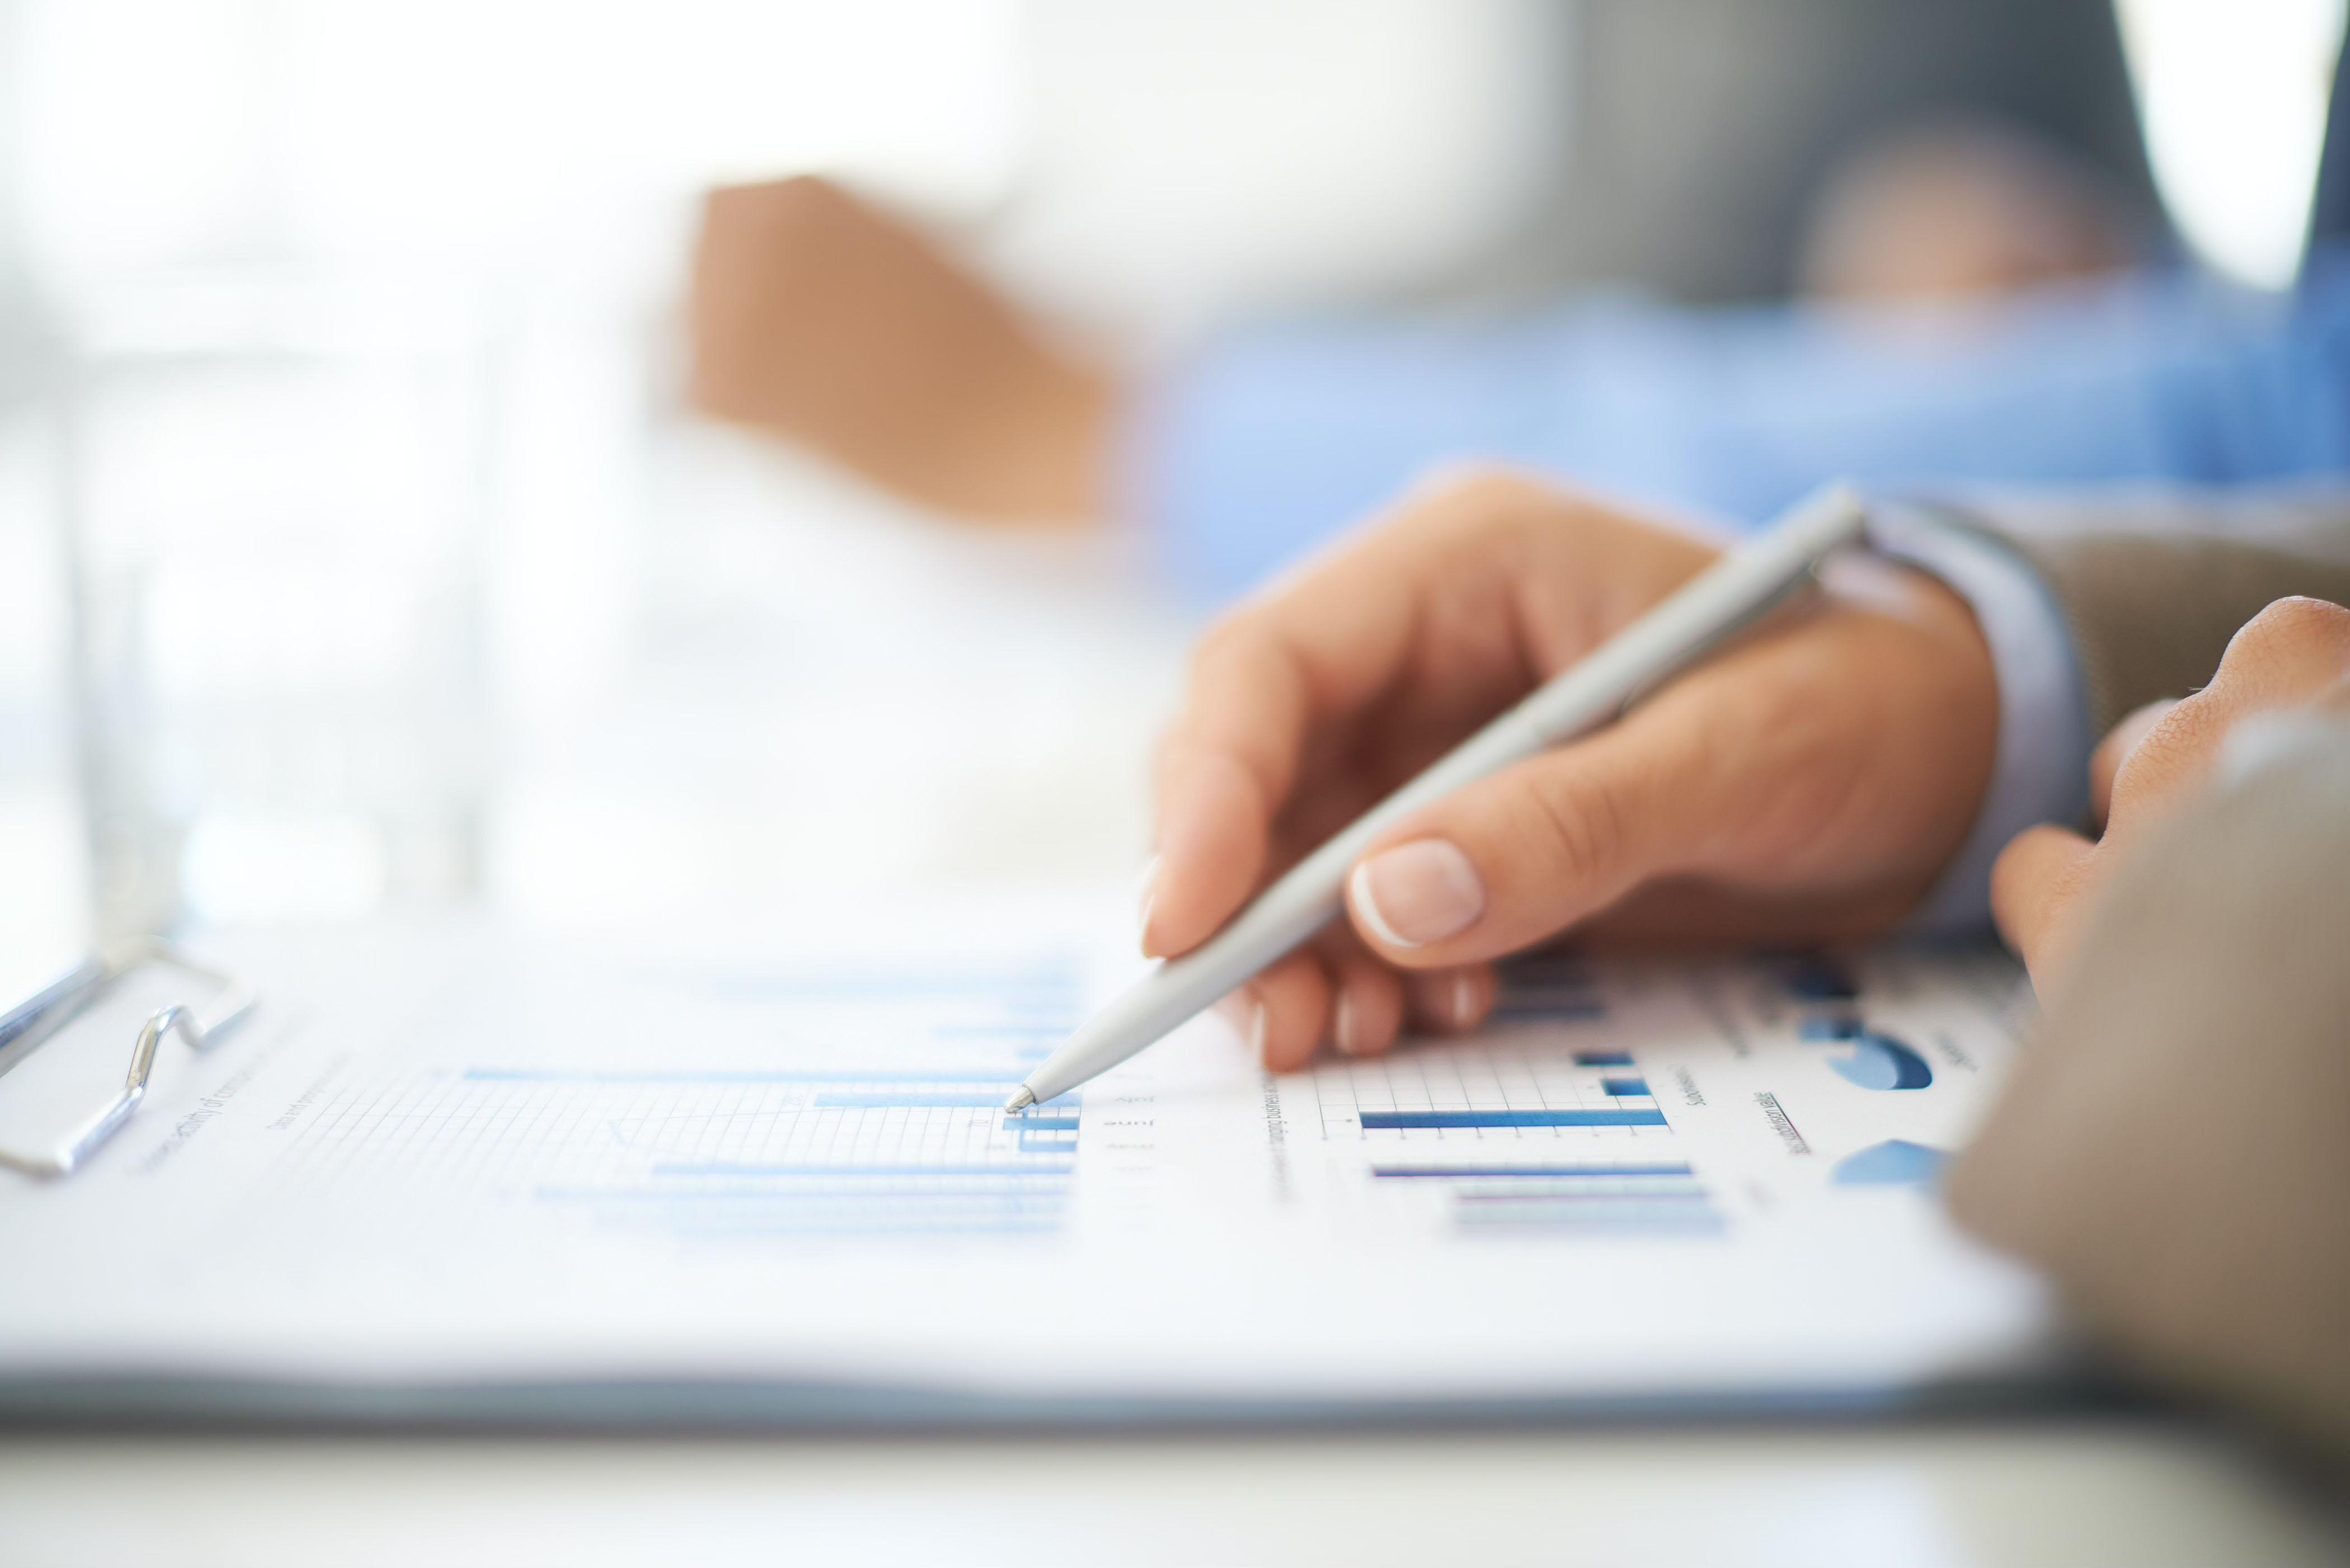 Four Factors for Deciding When to Outsource Business Processes